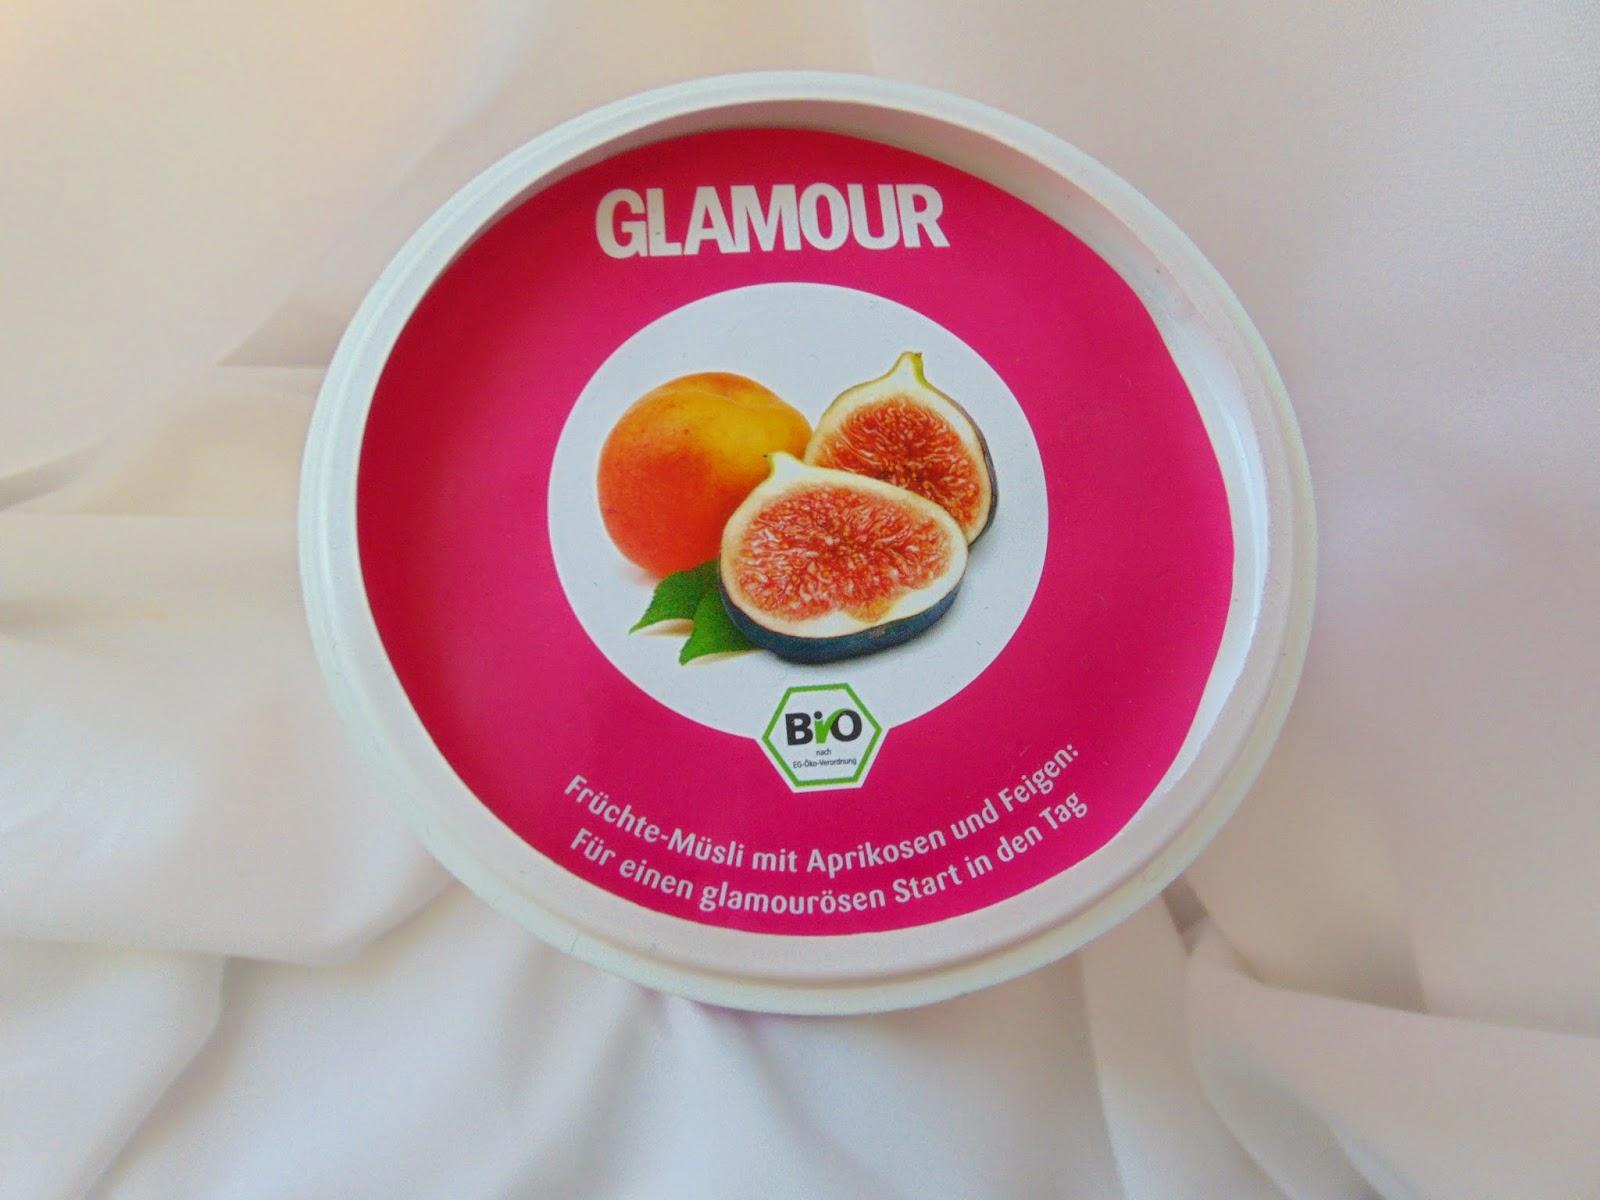 My Muesli - Glamour Shopping Week - Glamour Müsli - www.annitschkasblog.de